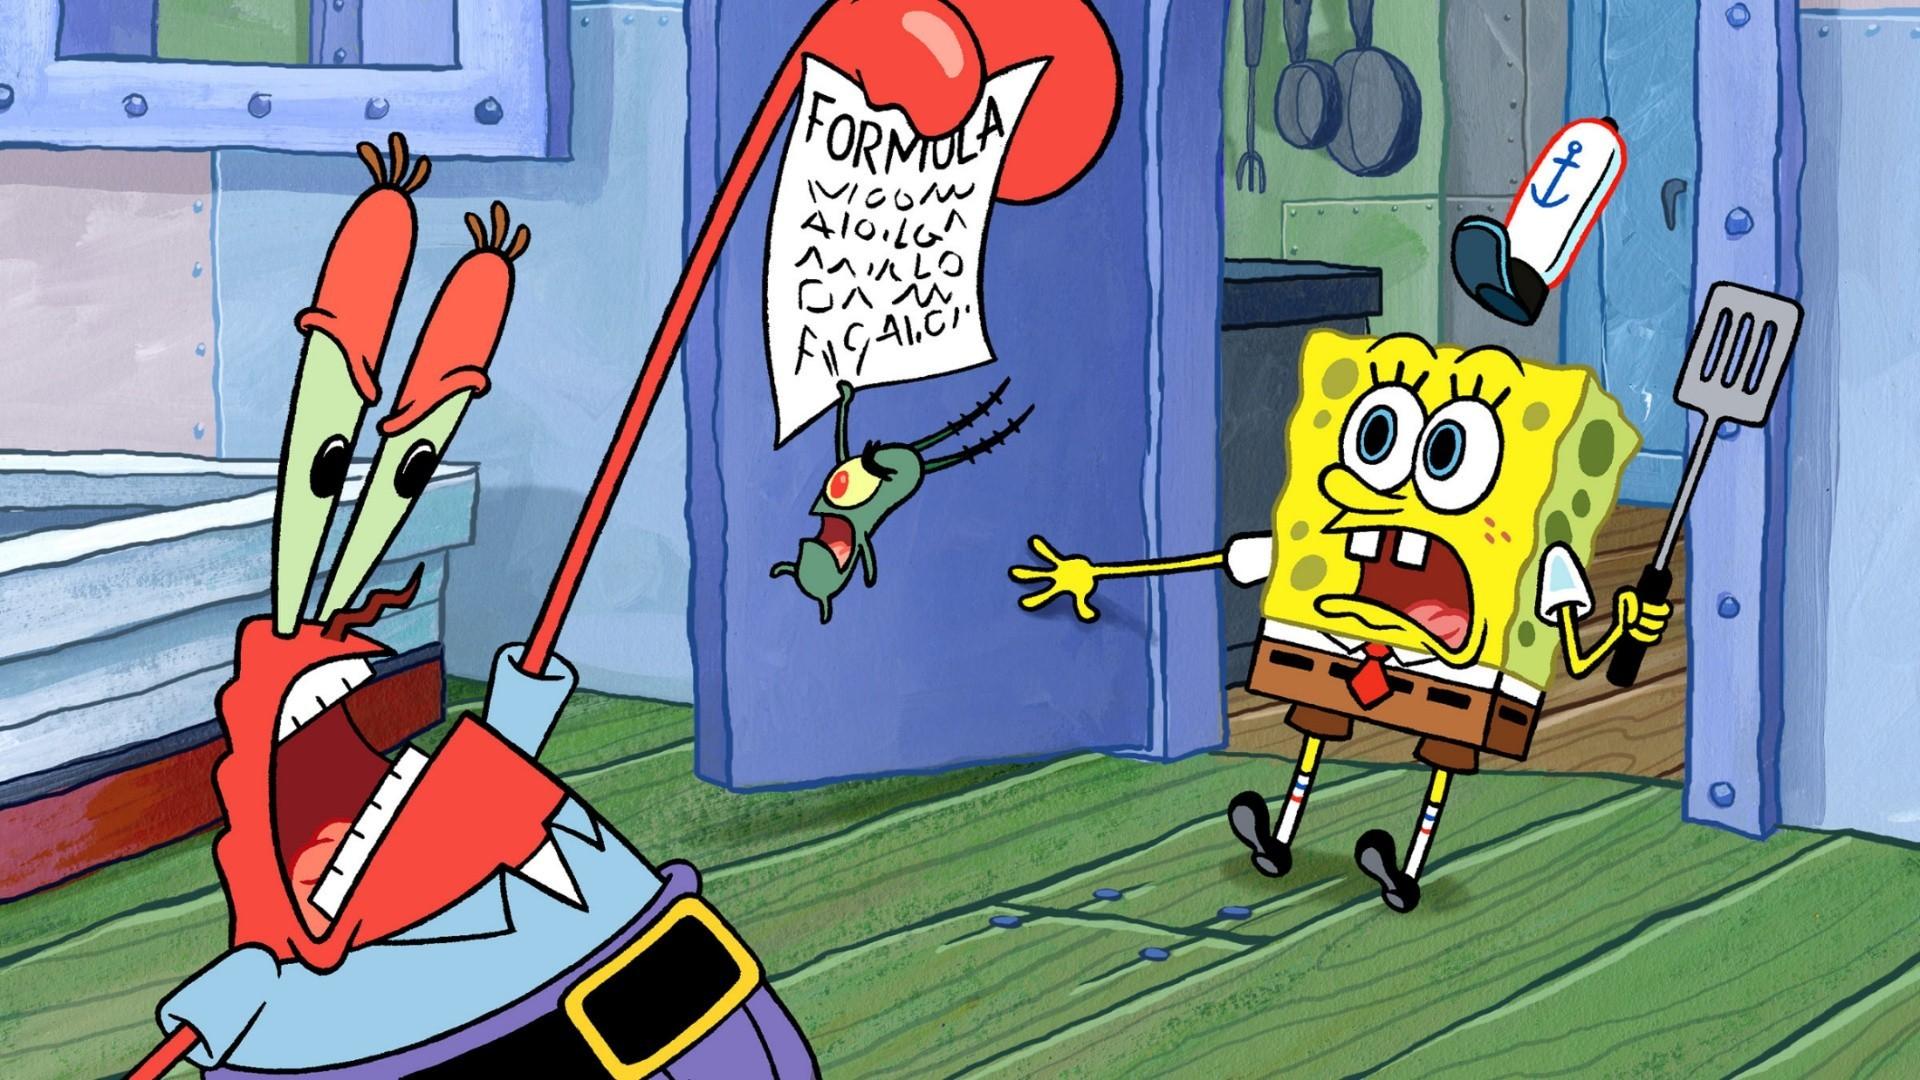 Pretty Little Liars Iphone Wallpaper Spongebob Squarepants Full Hd Wallpaper And Background